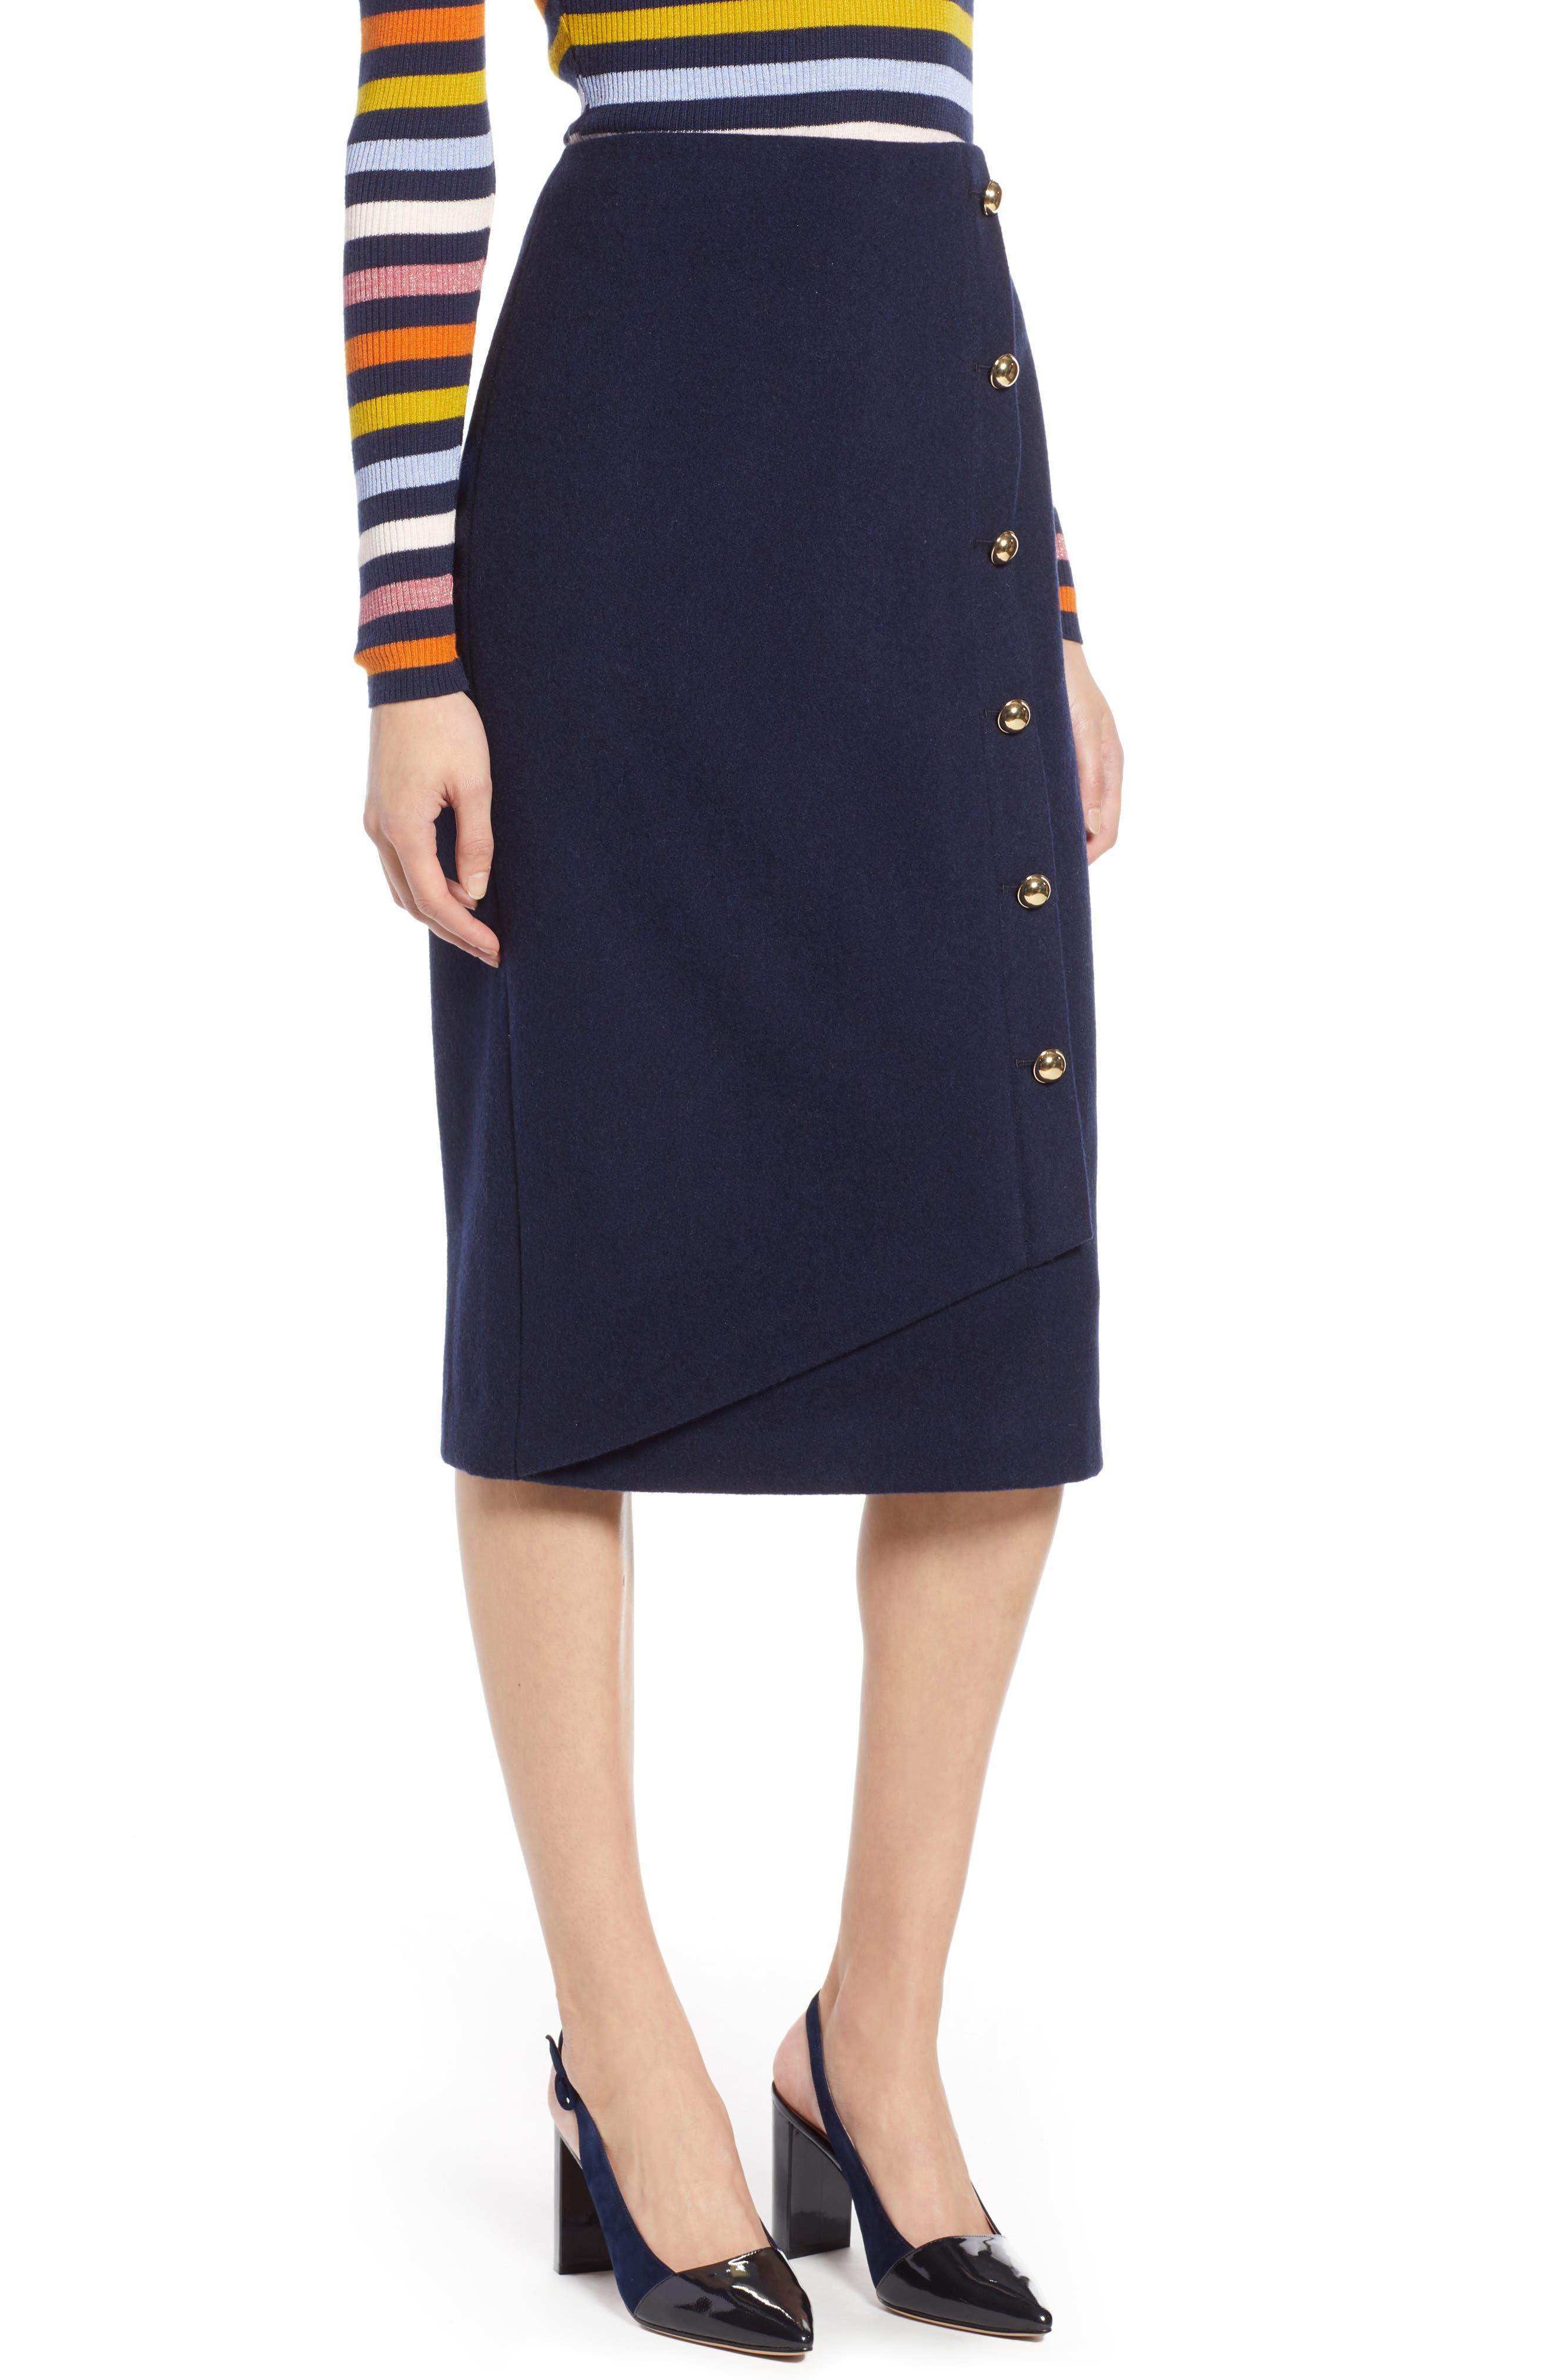 x Atlantic-Pacific Wrap Pencil Skirt,                         Main,                         color, NAVY BLAZER